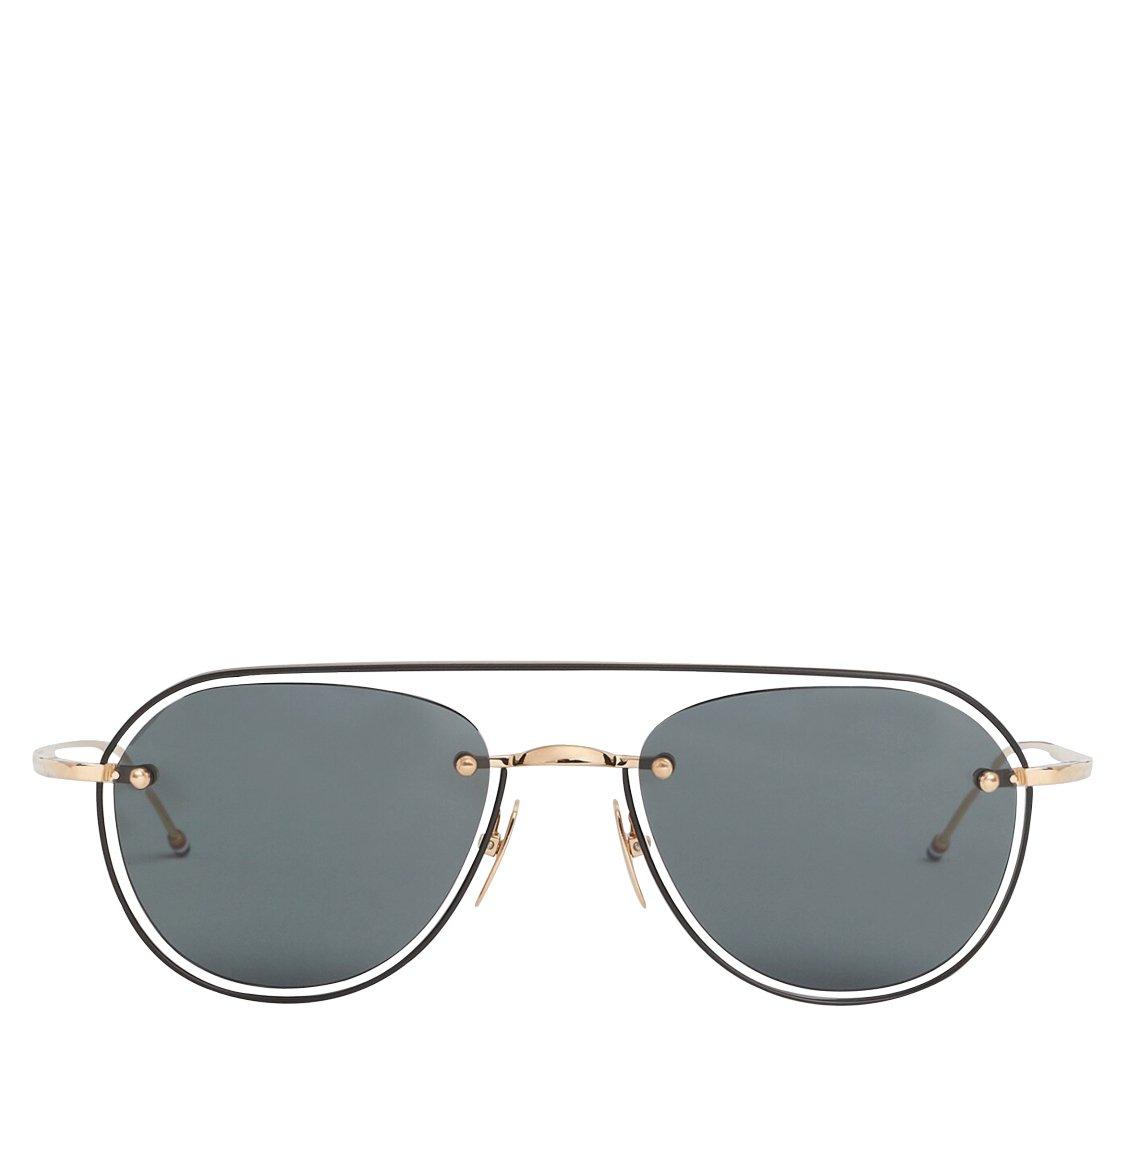 Thom Browne 59 White Gold And Black Enamel Aviator Sunglasses Γυαλιά Ηλίου